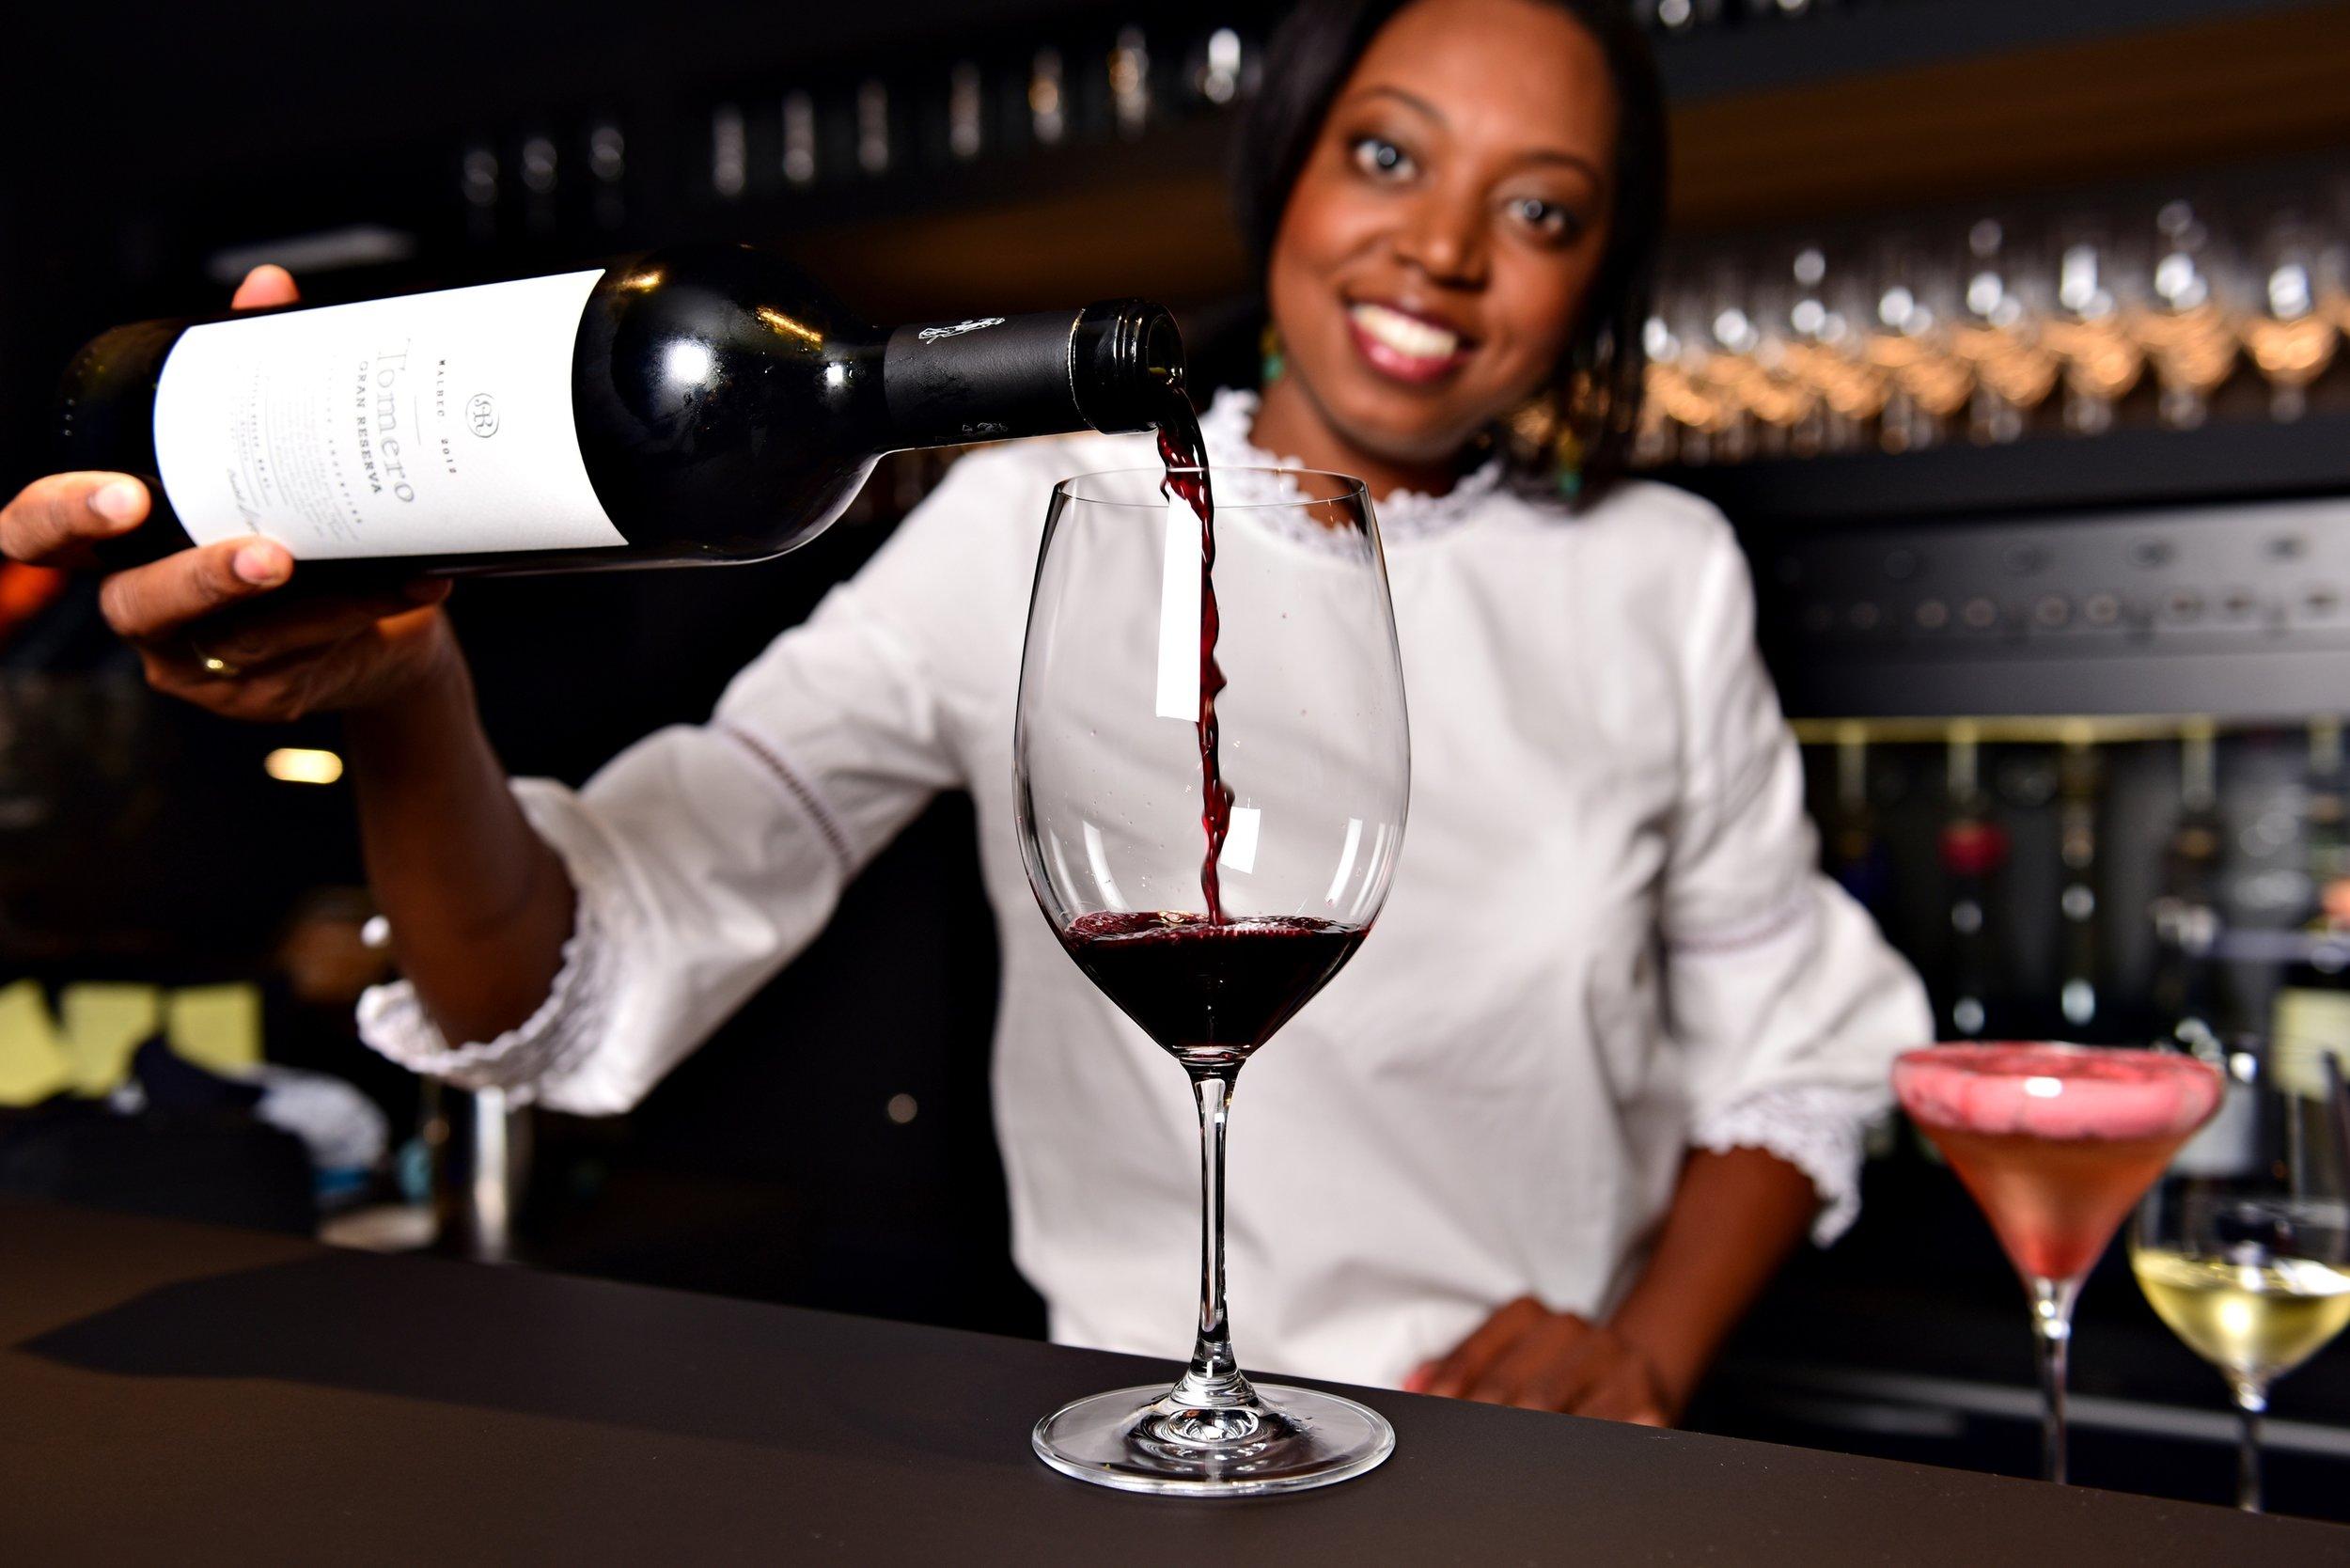 43 vinum sensum knokke wijnbar restaurant tablefever bart albrecht food culinair fotograaf.jpg